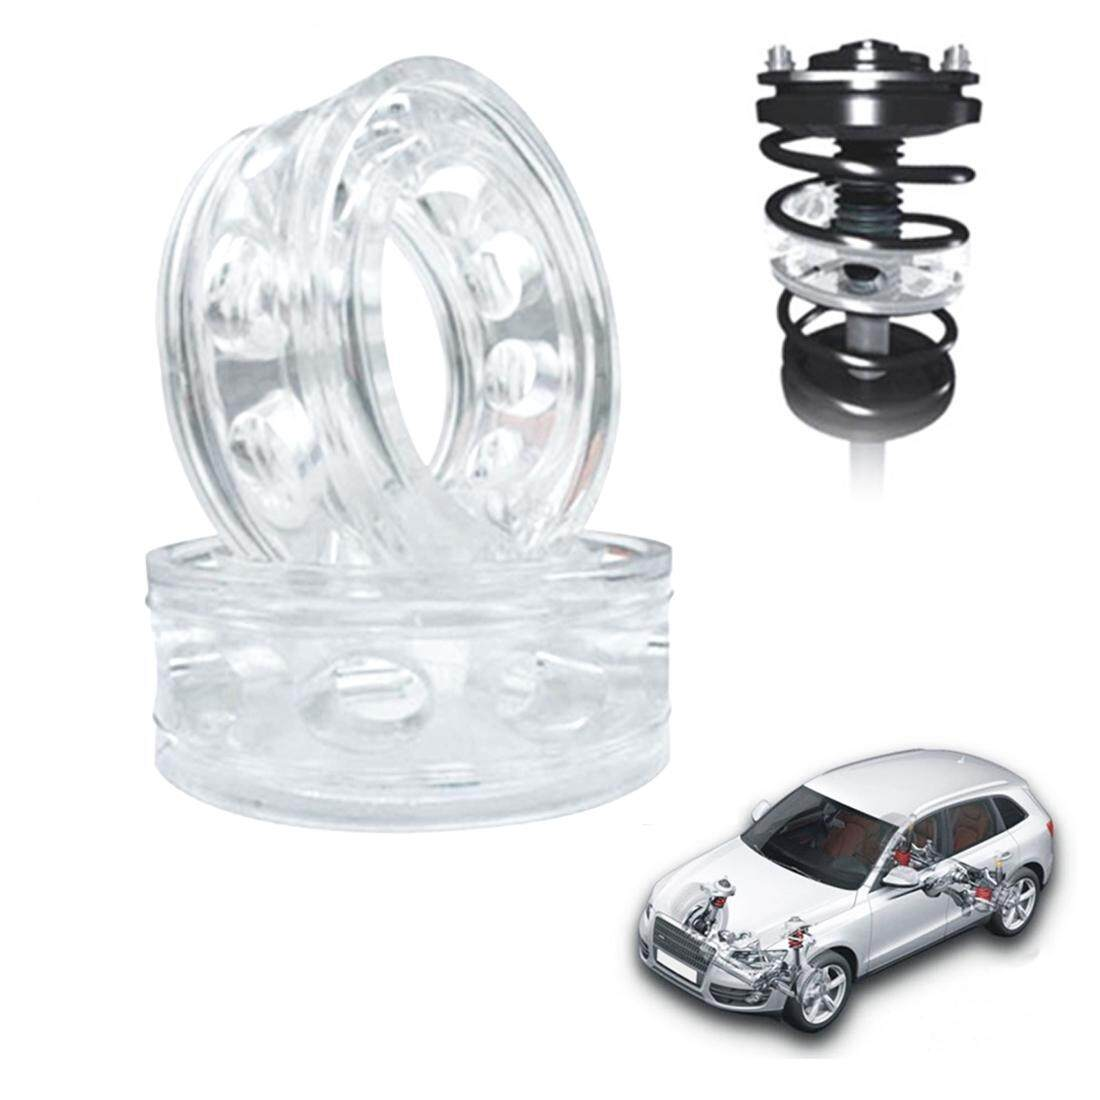 2 Pcs Car Auto B Type Shock Absorber Spring Bumper Power Cushion Buffer By Powerful-Enterprise.